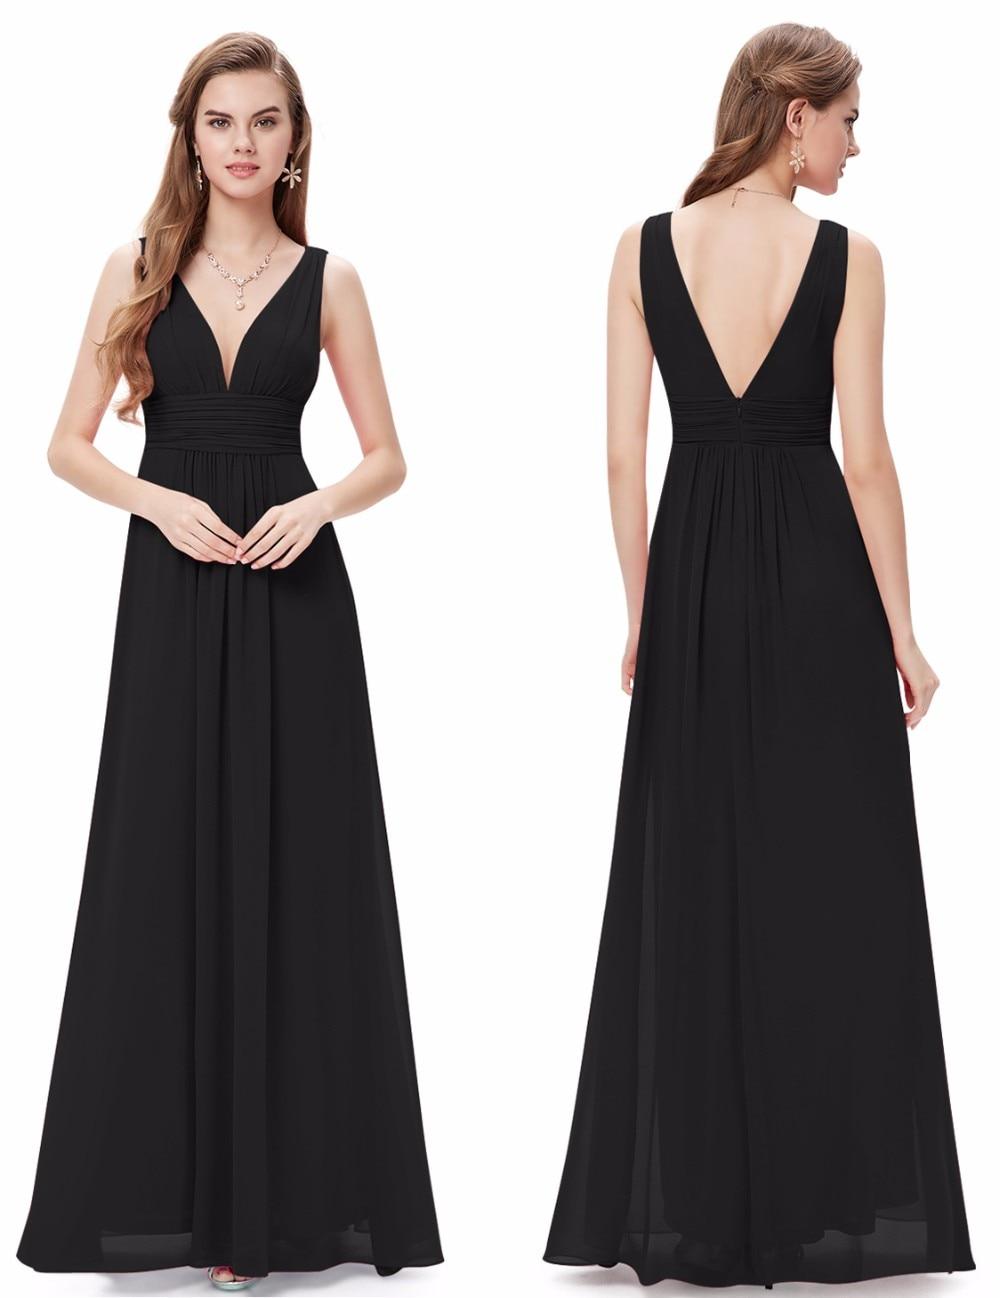 Formal Long Women Elegant Navy Blue V Neck Sleeveless Empire 2020 New Cheap V Back Party Gown Bridesmaid Dresses